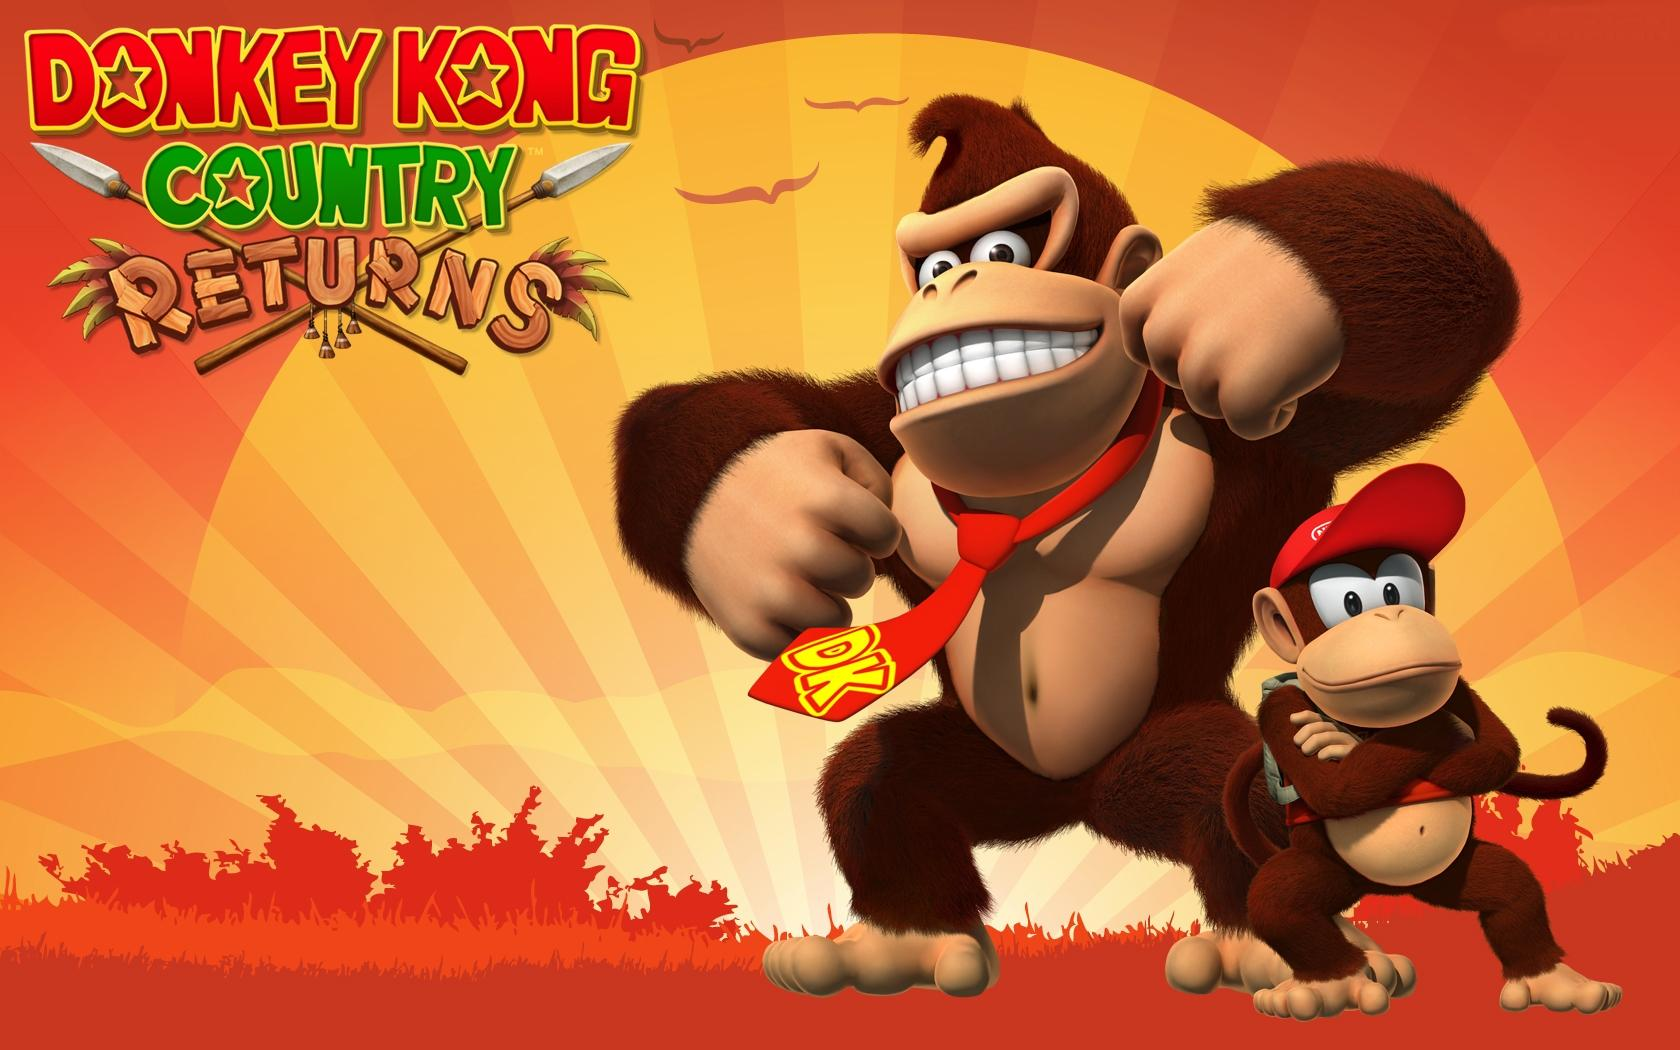 Donkey Kong Country Returns ganha versão exclusiva FULL HD na China